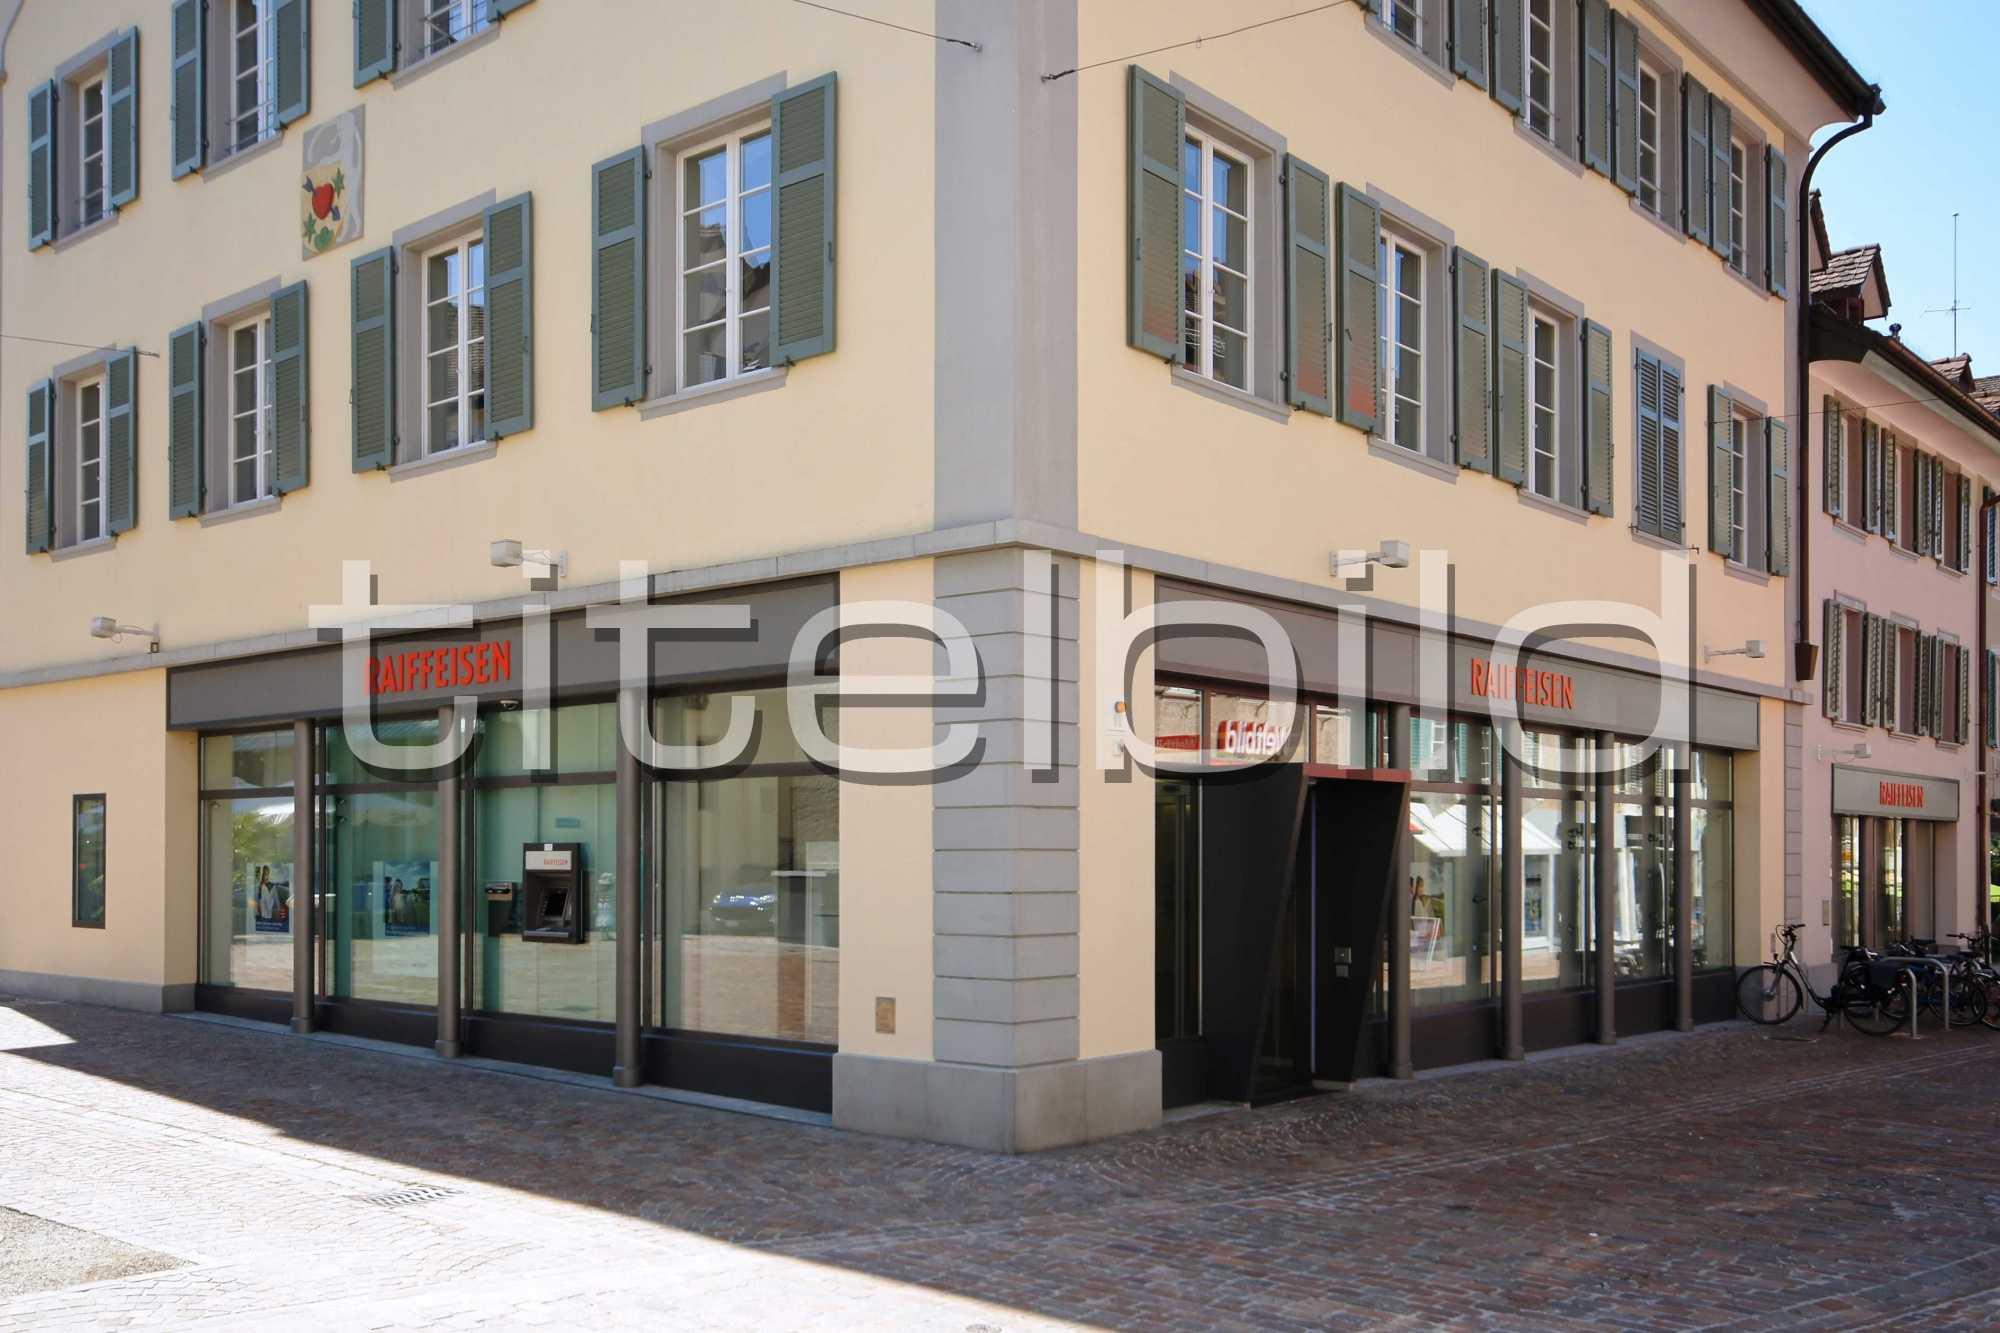 Projektbild-Nr. 2: Bankgebäude der Raiffeisenbank Frauenfeld